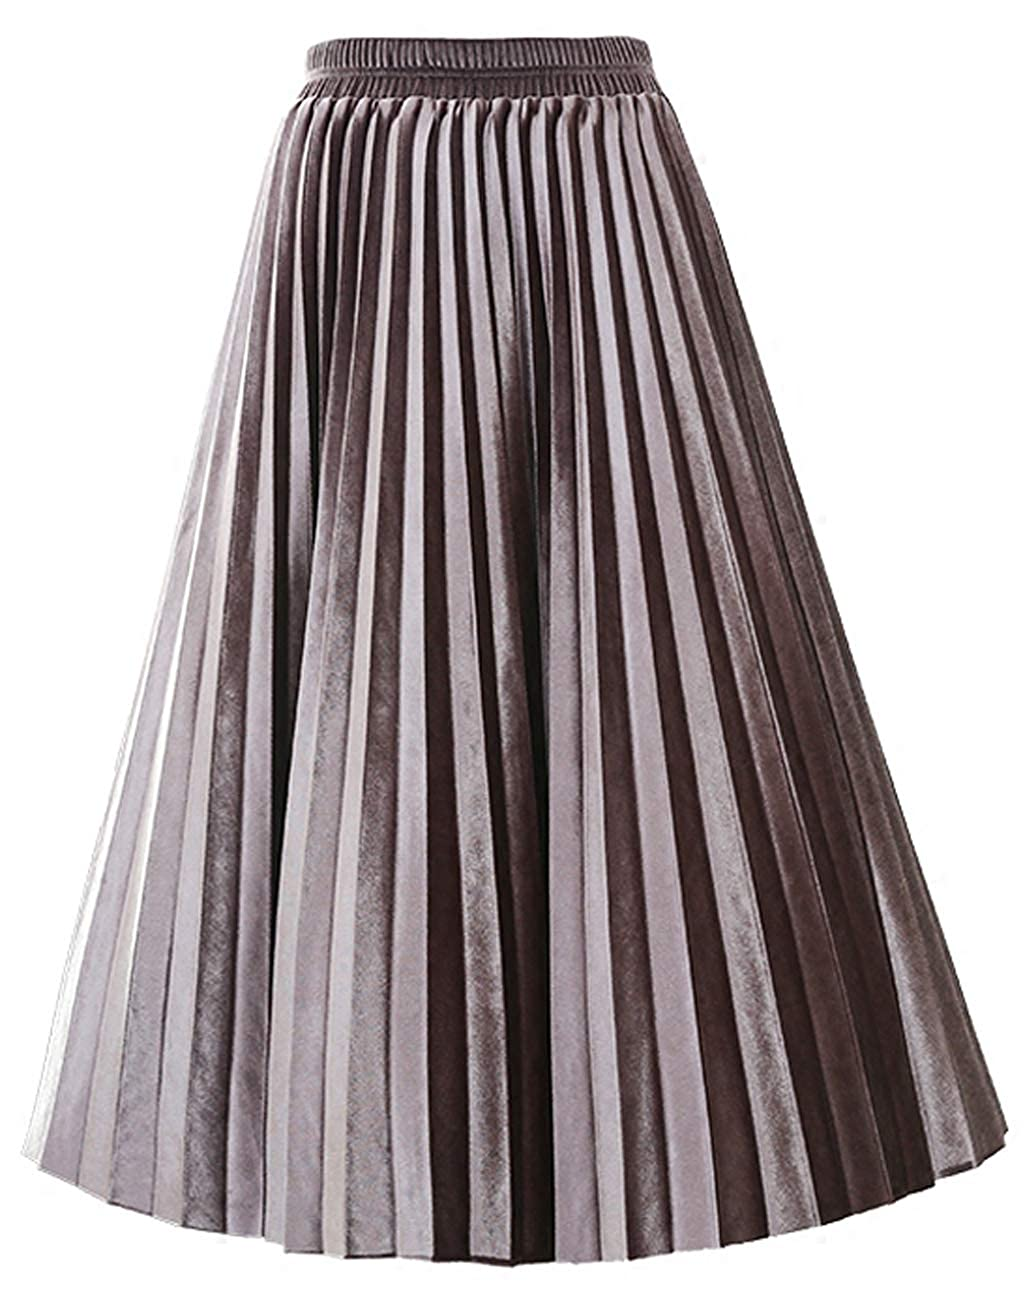 999c718b29f7 SCHHJZPJ Autumn Winter Skirt, Women's Velvet Vintage Pleated Midi Skirts at  Amazon Women's Clothing store: